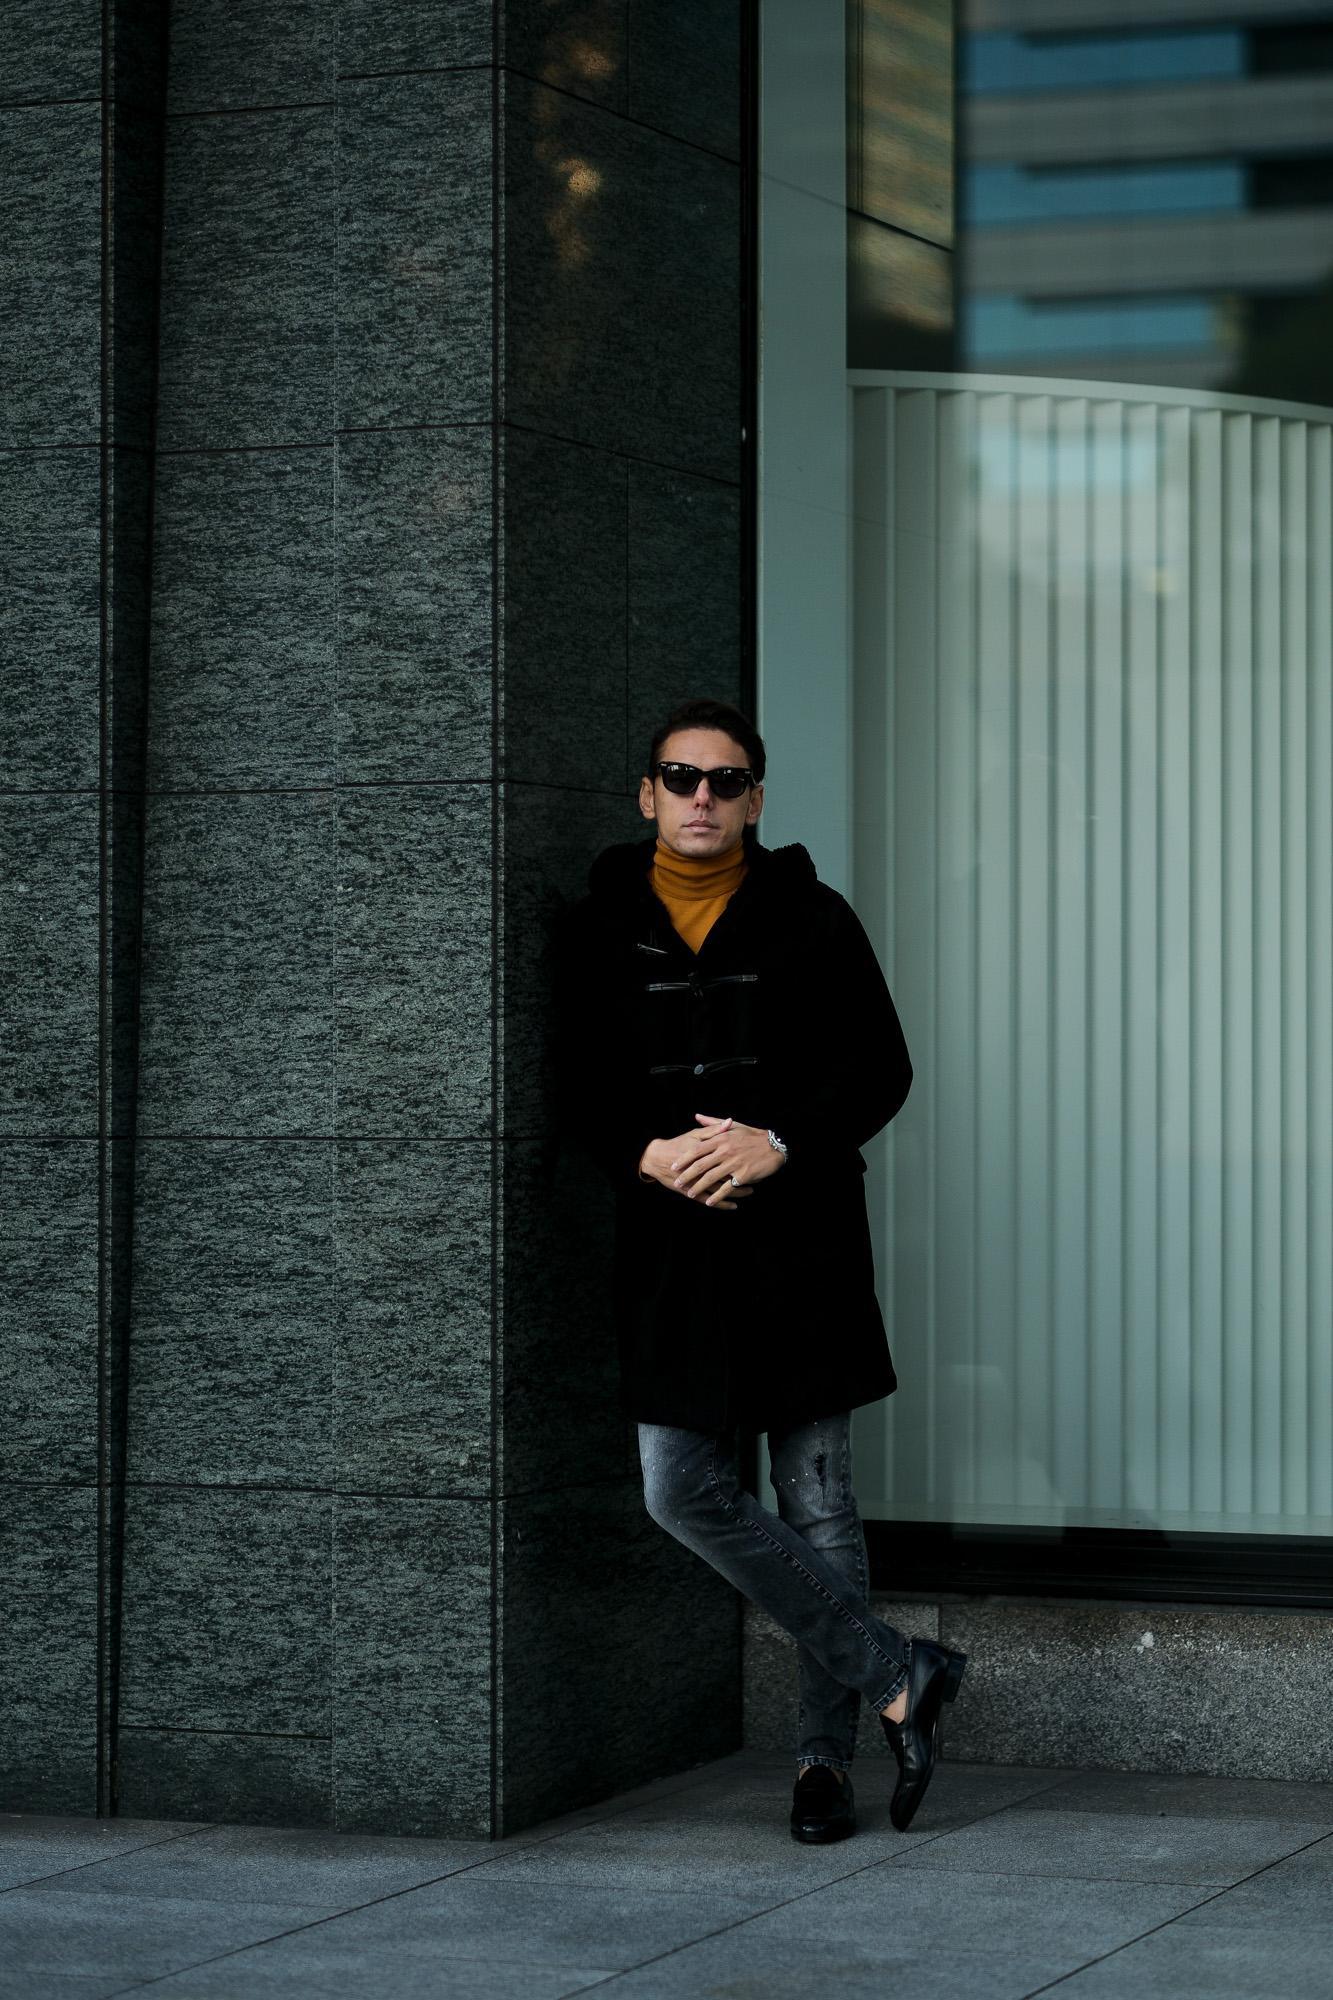 SILENCE(サイレンス) Mouton Duffle Coat D.F.MERINO SPAGNOLO (ミディアムヘアームートン) ムートン ダッフルコート NERO (ブラック) Made in italy (イタリア製) 2020 秋冬 愛知 名古屋 Alto e Diritto アルトエデリット